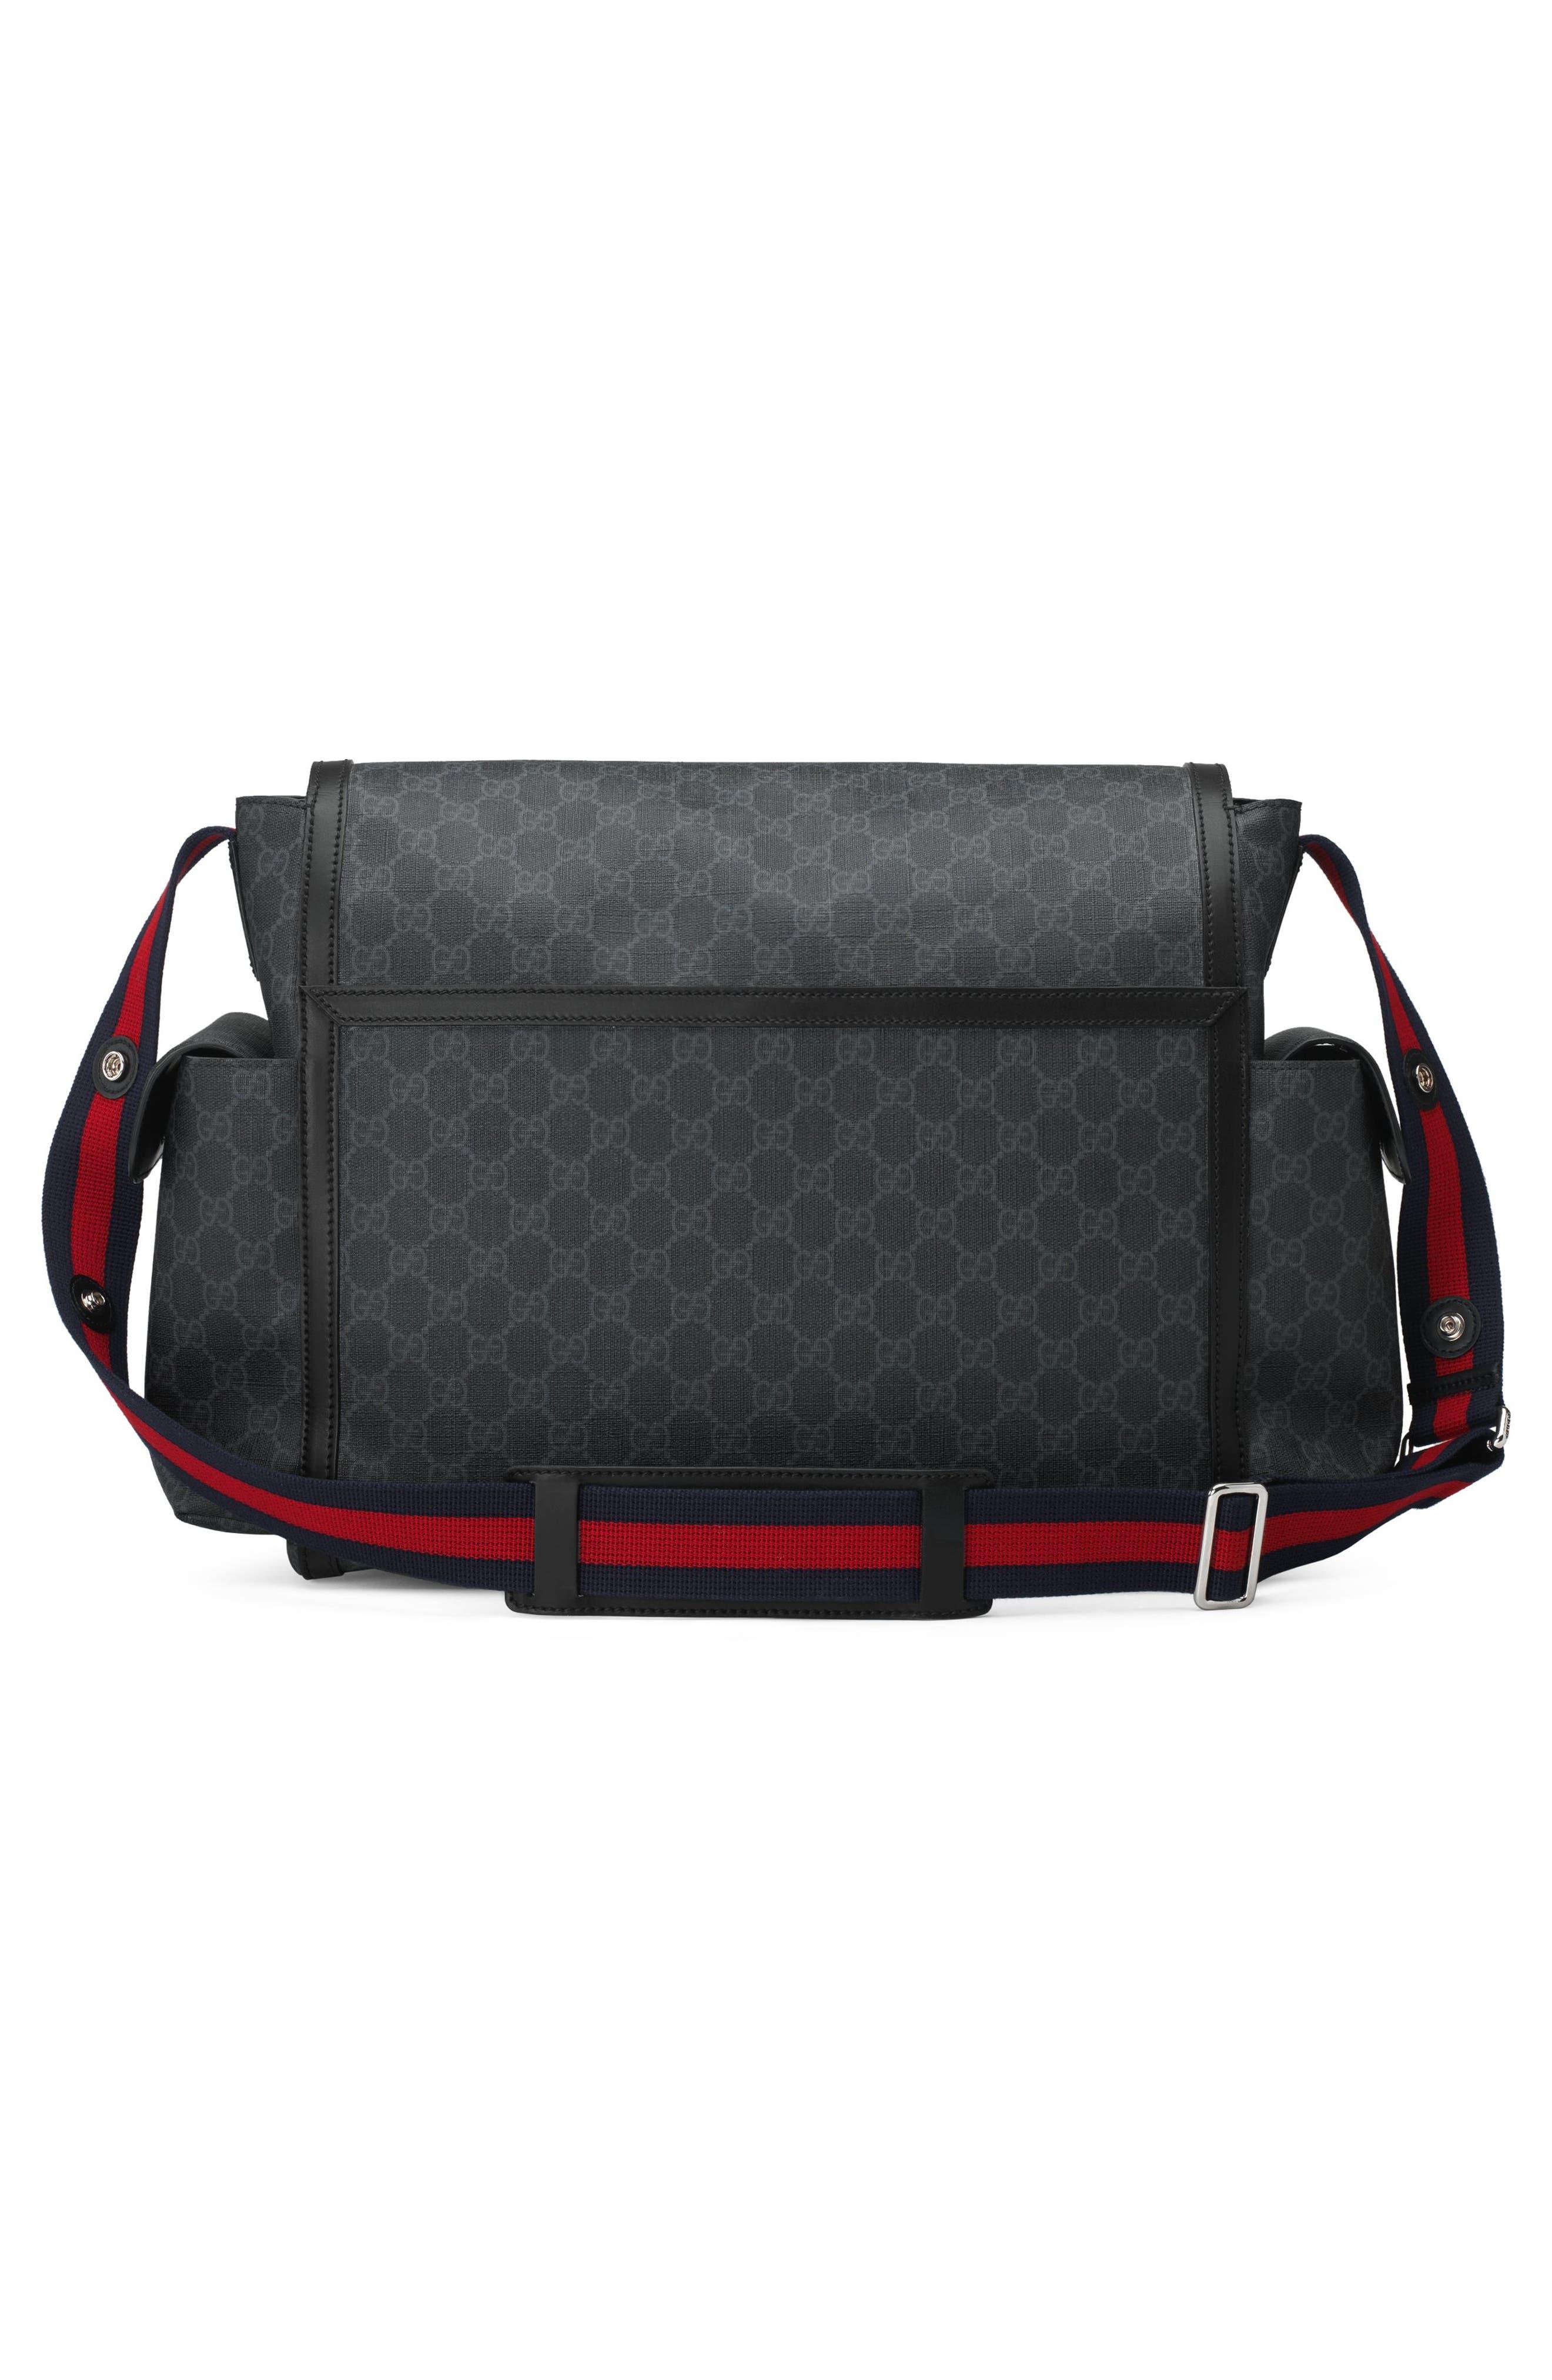 GG Supreme Canvas Diaper Bag,                             Alternate thumbnail 10, color,                             BLACK